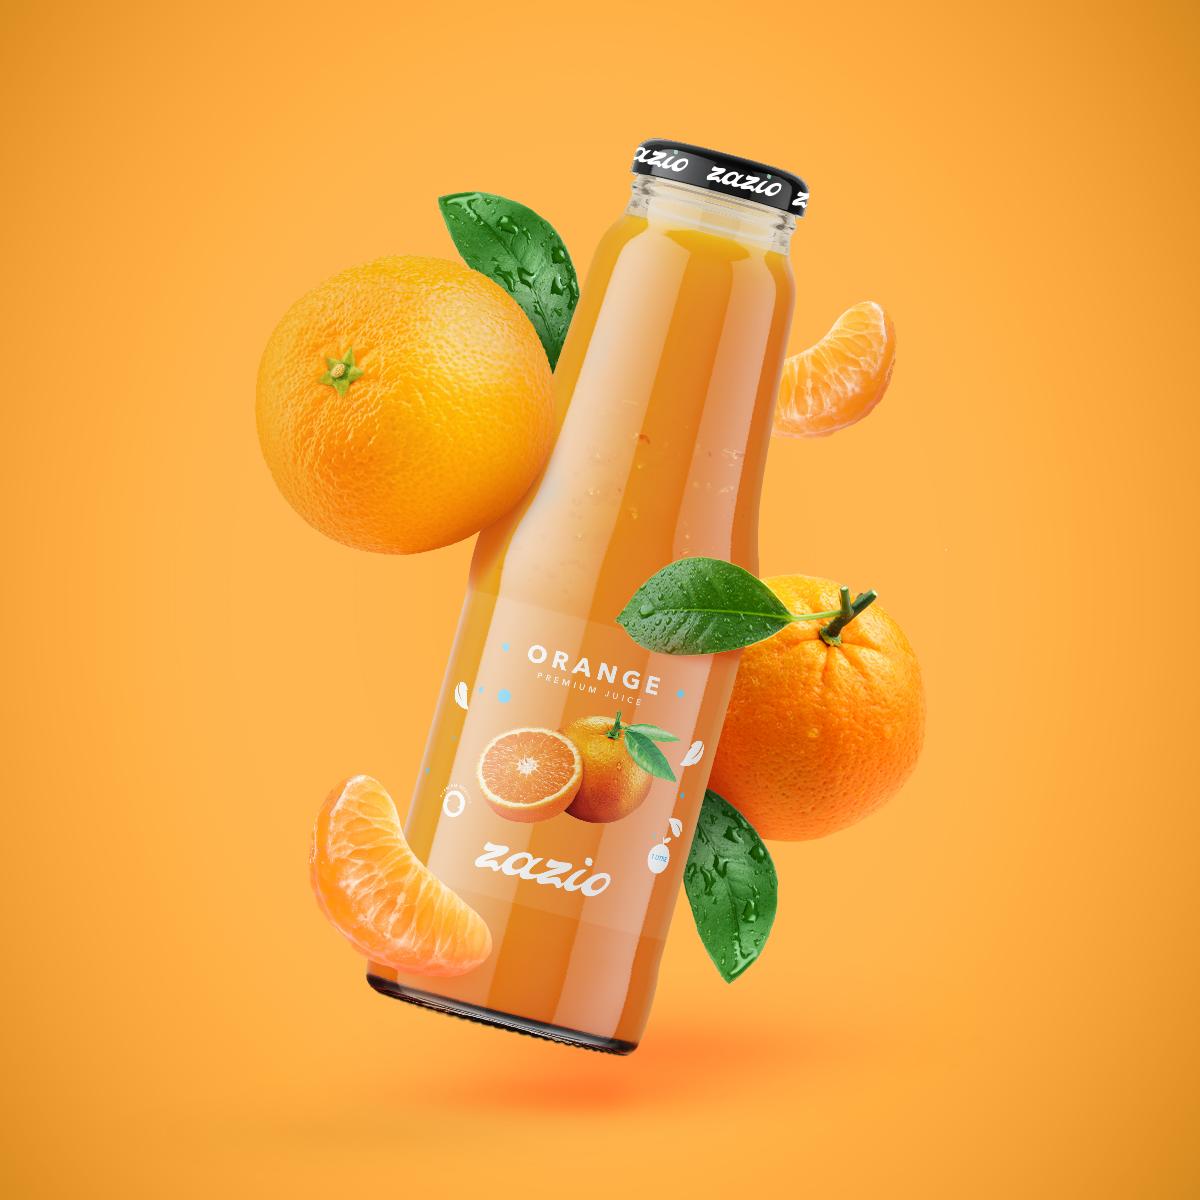 Zazio Juice – Packaging